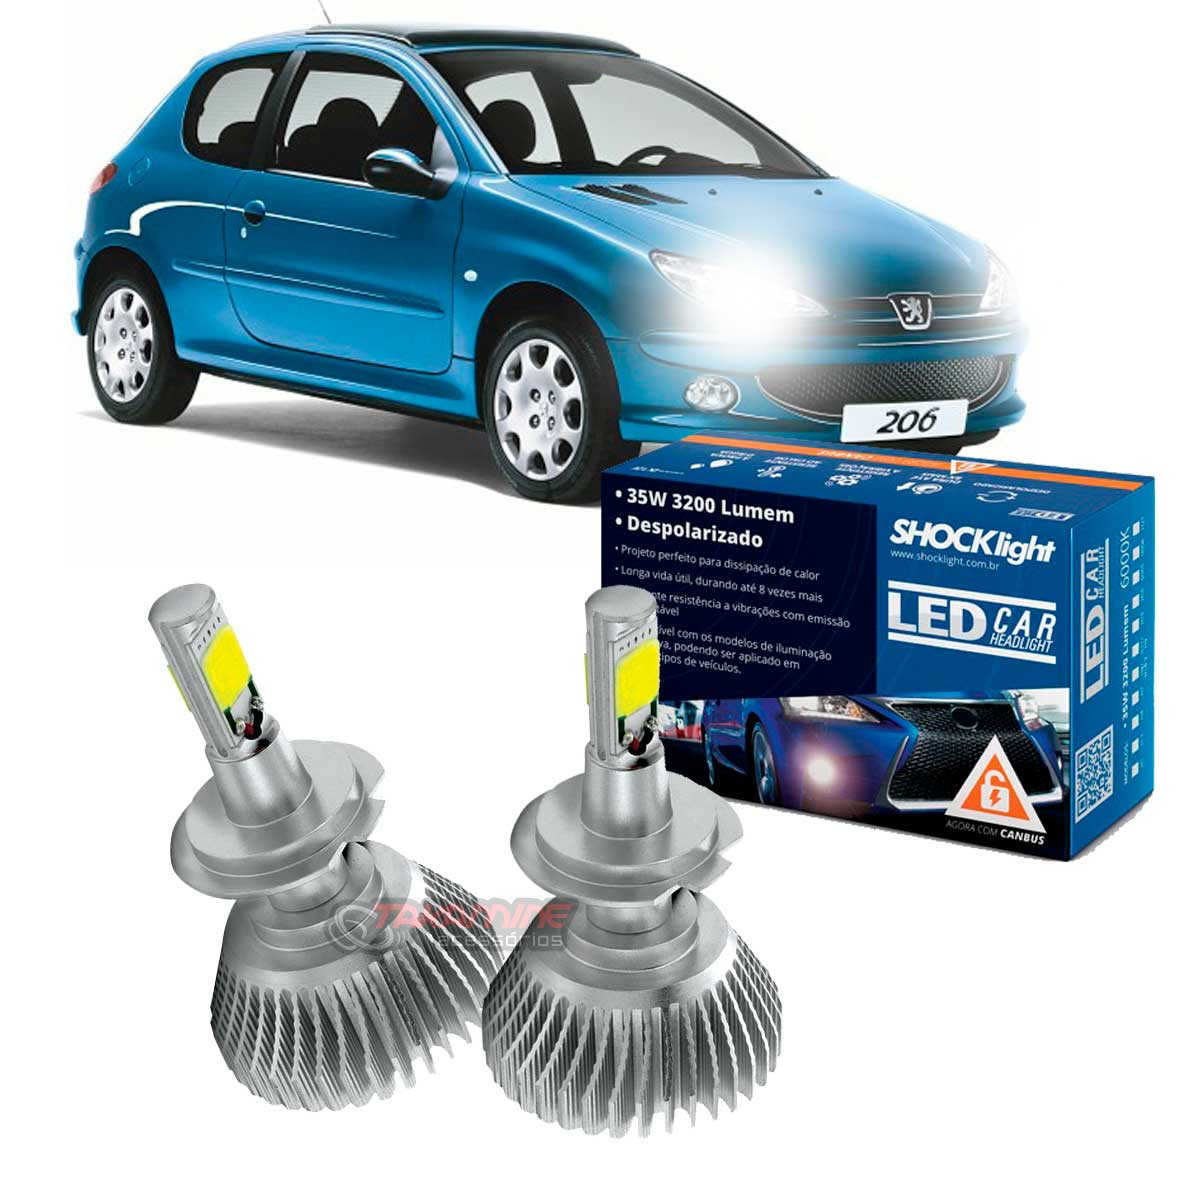 Kit LED Peugeot 206 Farol Duplo tipo xenon farol baixo H7 35W Headlight